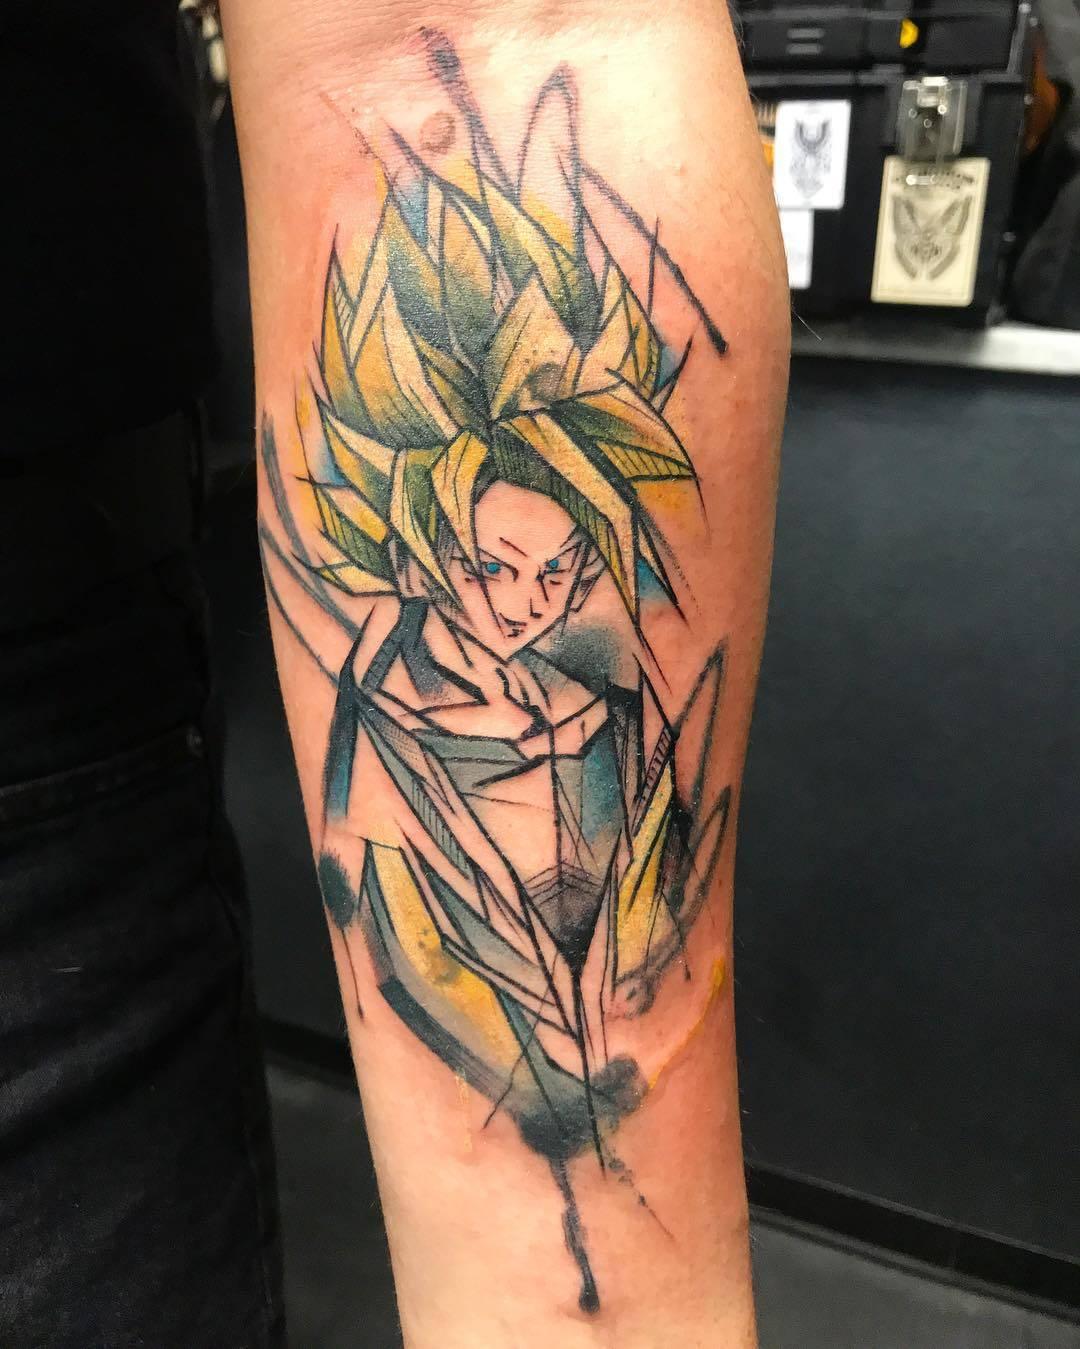 Ligera-Ink-tattoo-milano-tatuaggi-milano-migliori-tatuatori-milano-tatuaggio-watercolor-tatuaggio-acquerello-tattoo-watercolor-tatuaggio-supersayan